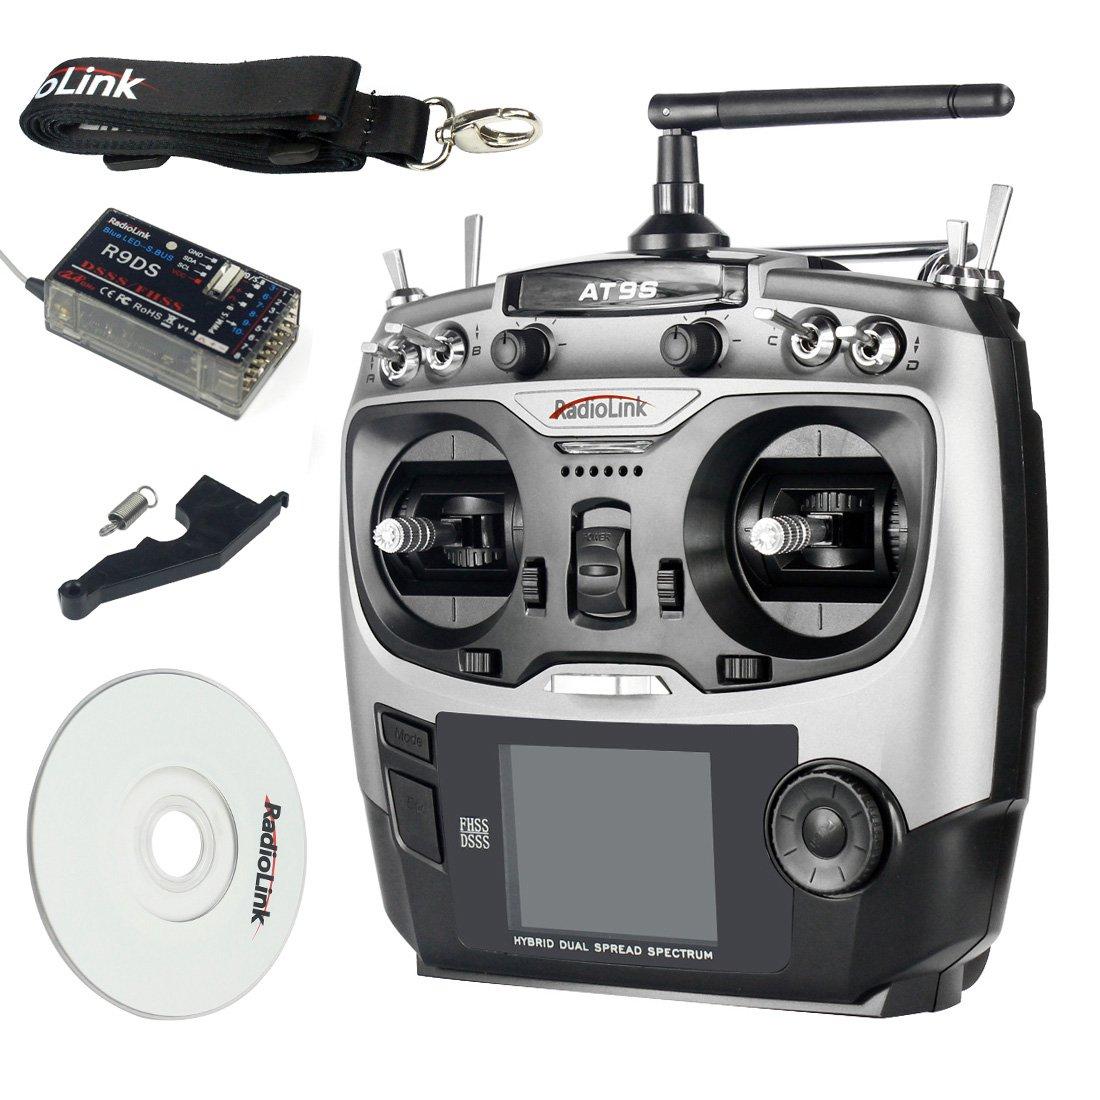 BGNing RadioLink AT9S 2.4 GHz 10CH AT9 mit Upgrade Sender mit AT9 R9DS DSSSS FHSS Empfänger Fernbedienung für RC Quadcopter Helikopter 8f4a95